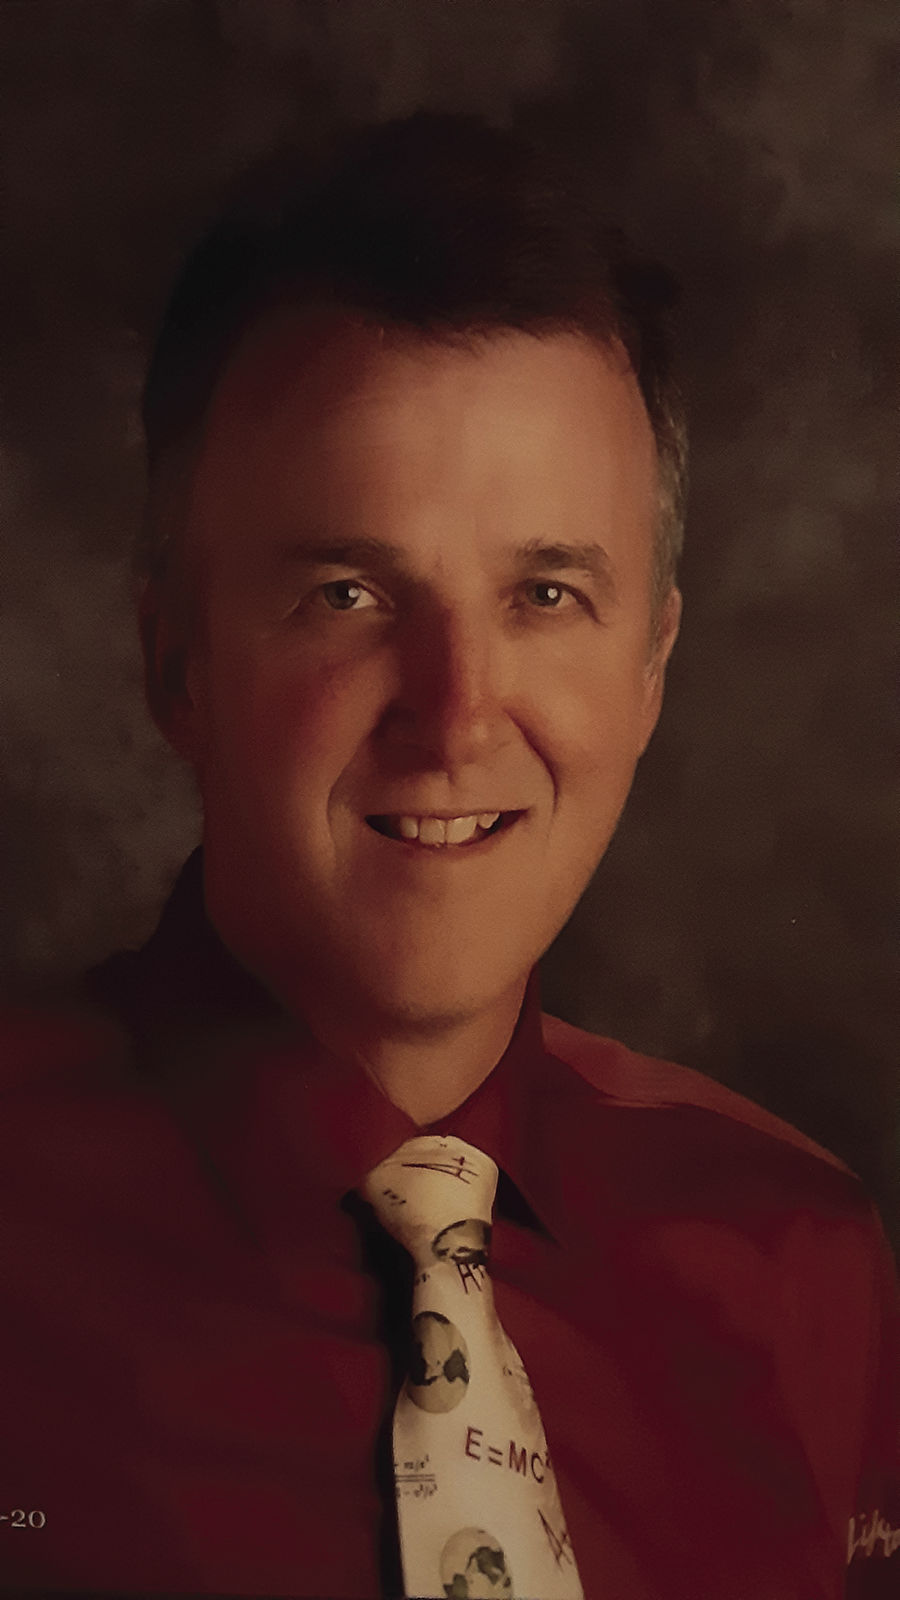 Randy Stoick